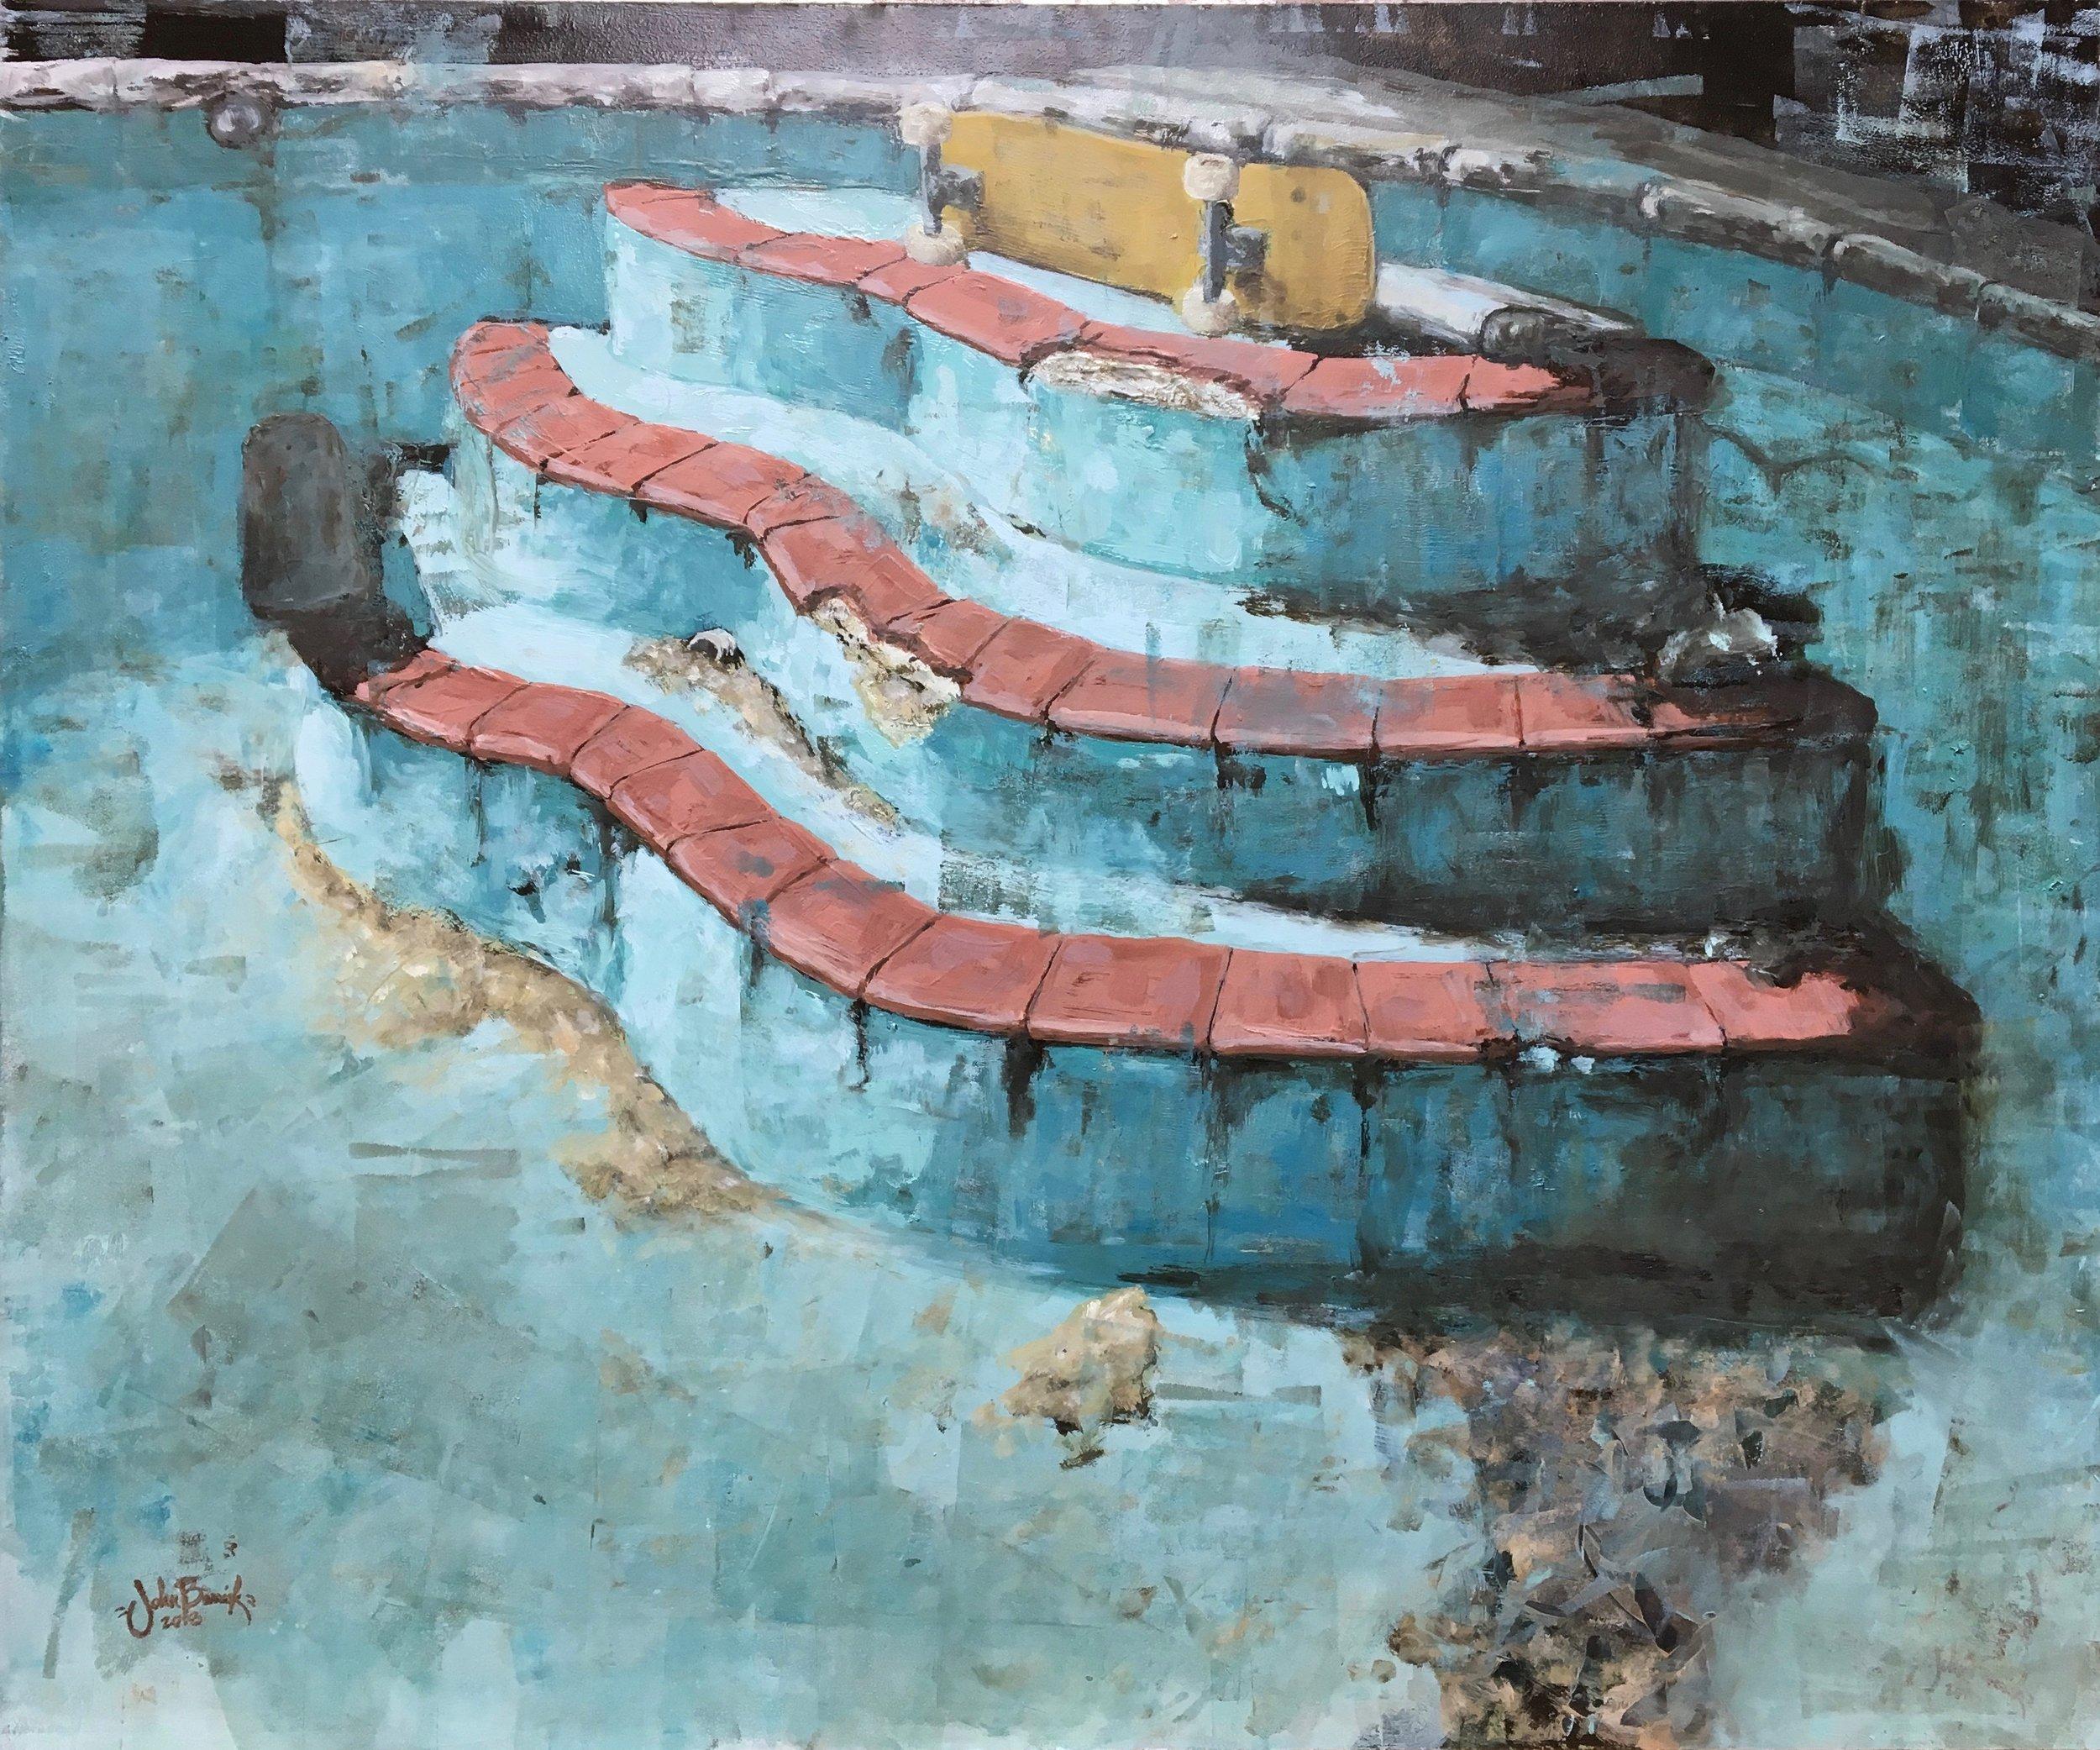 John-Barrick-empty-pool-painting.jpg